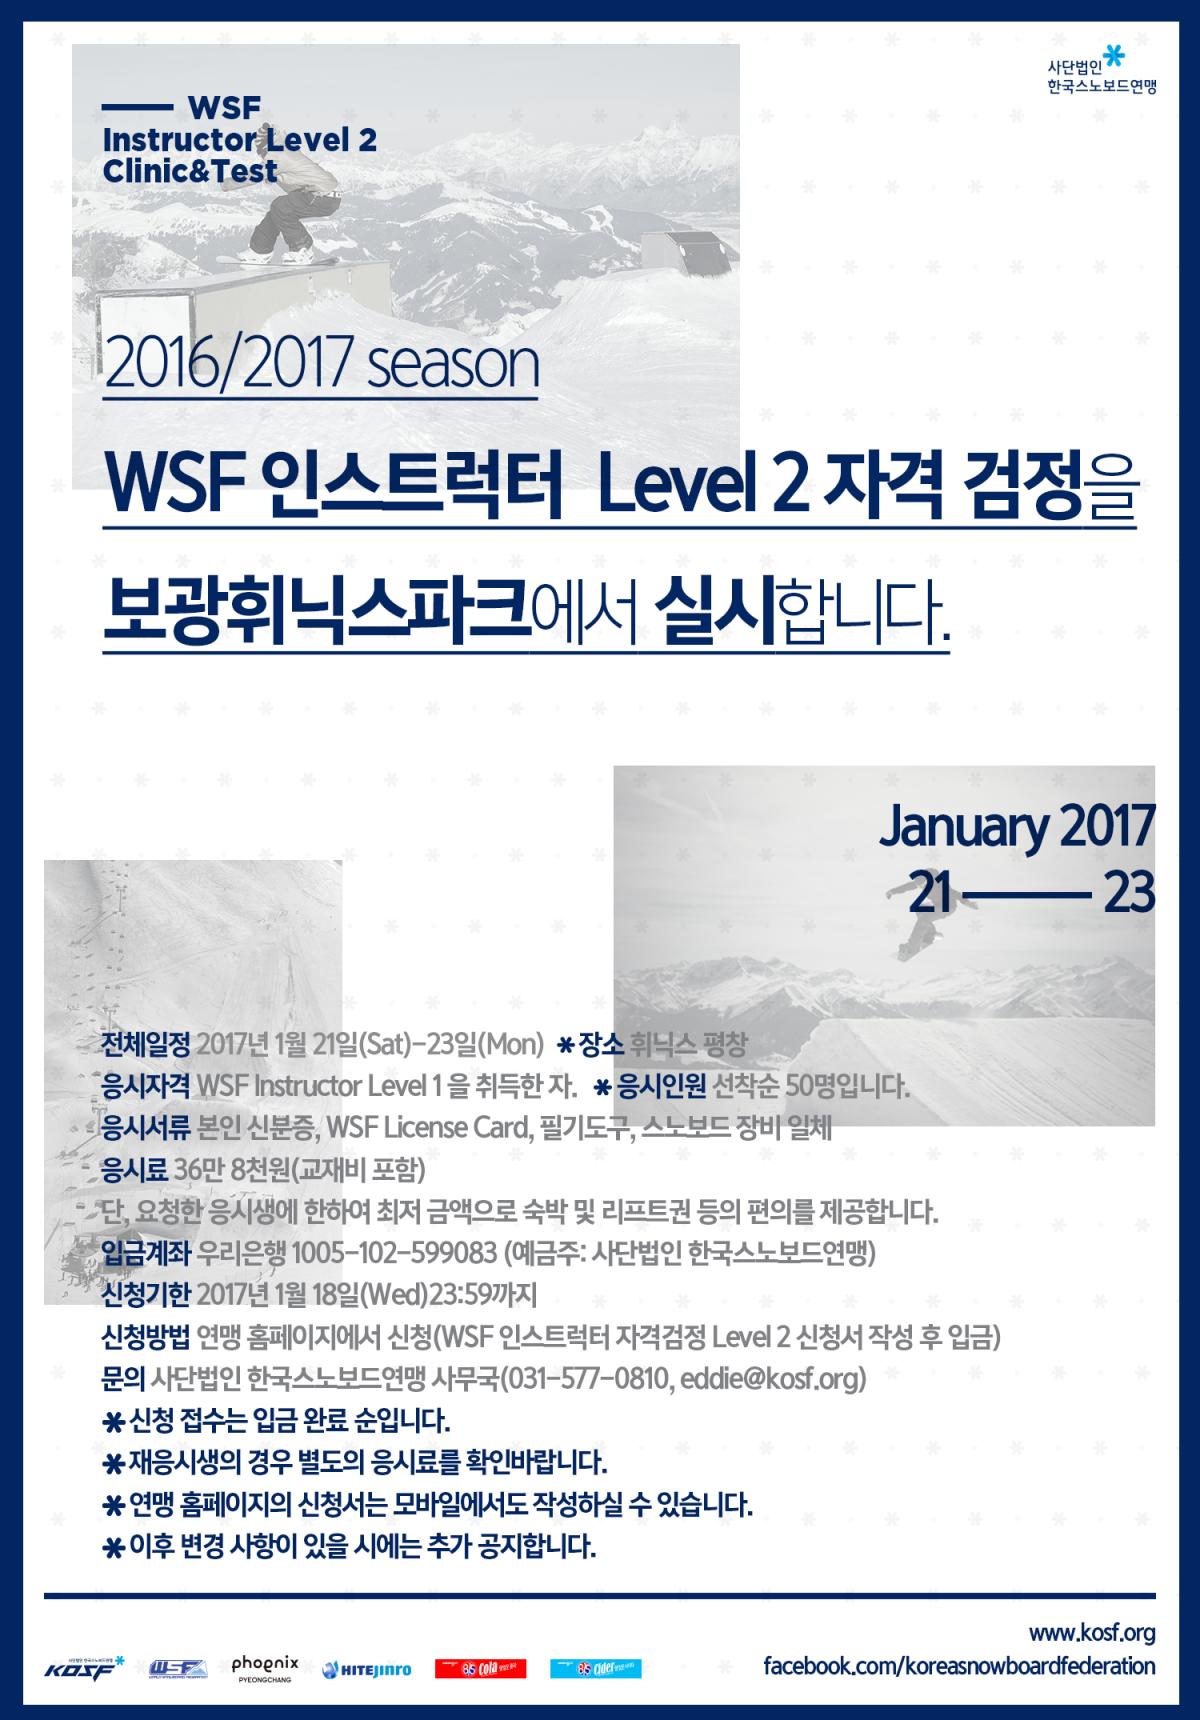 kosf_WSFinstructor_lv2test20170121_01.png